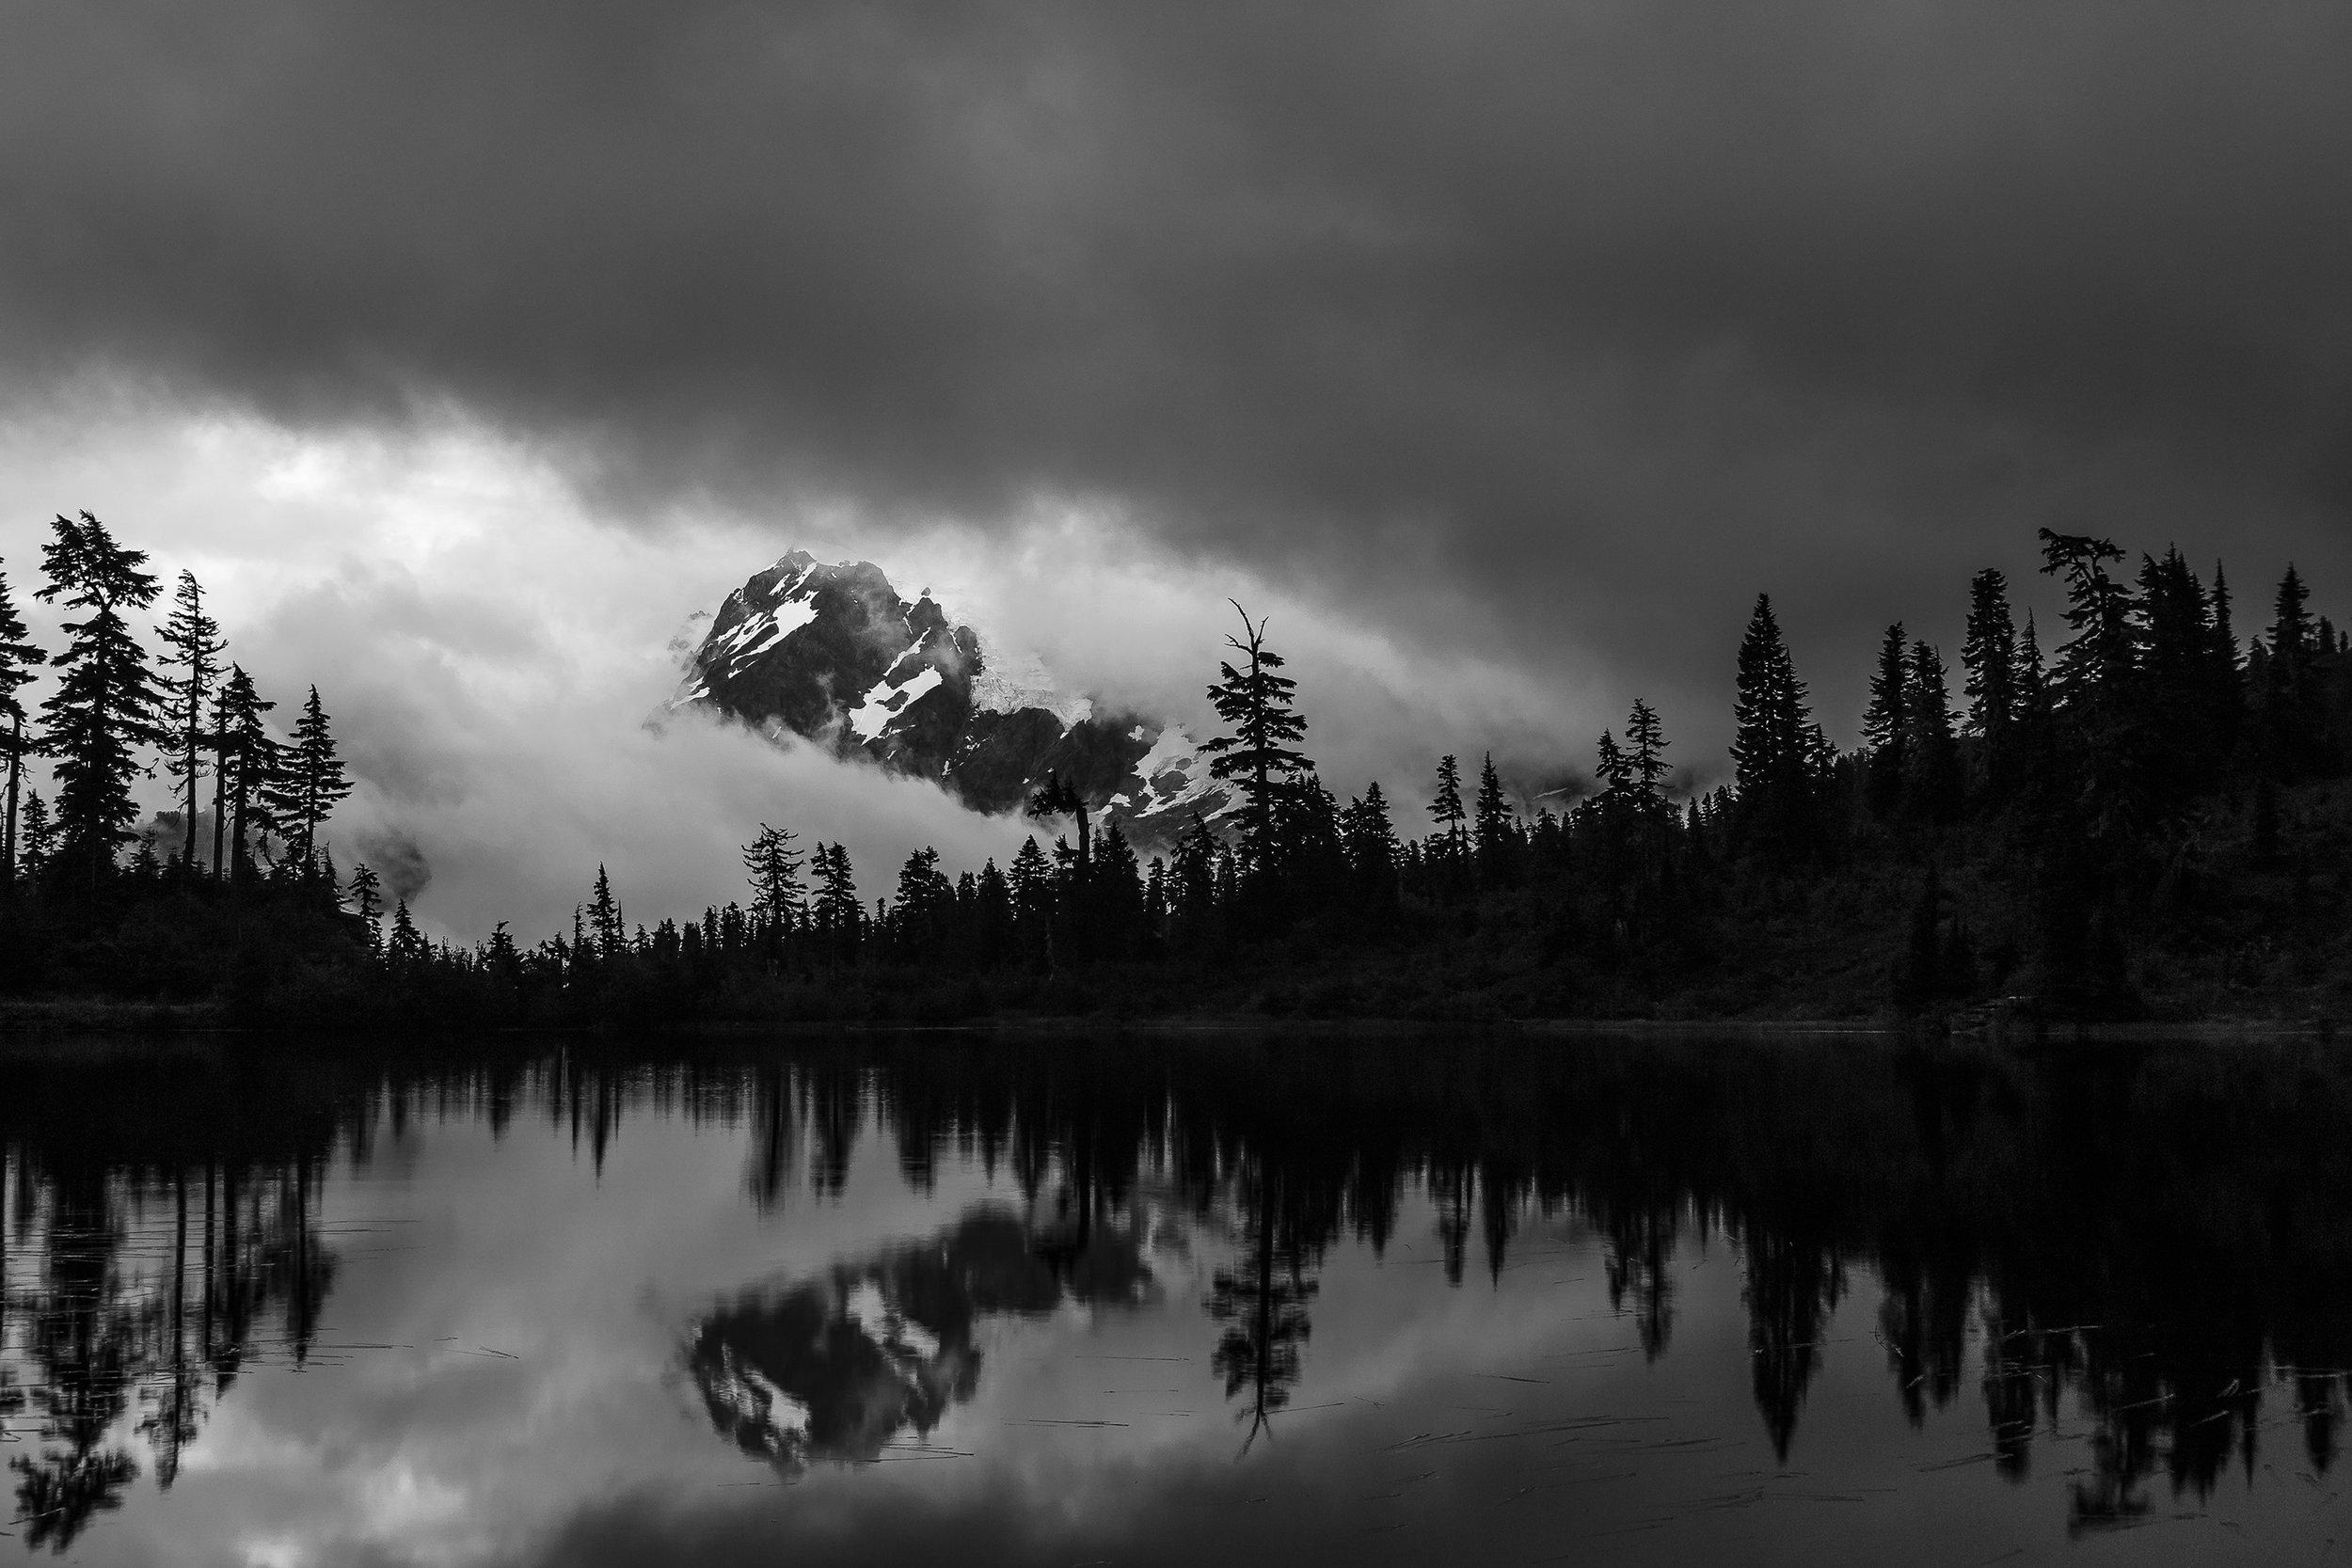 Storms On Mount Shuksan  © Andrew Lockwood 2017